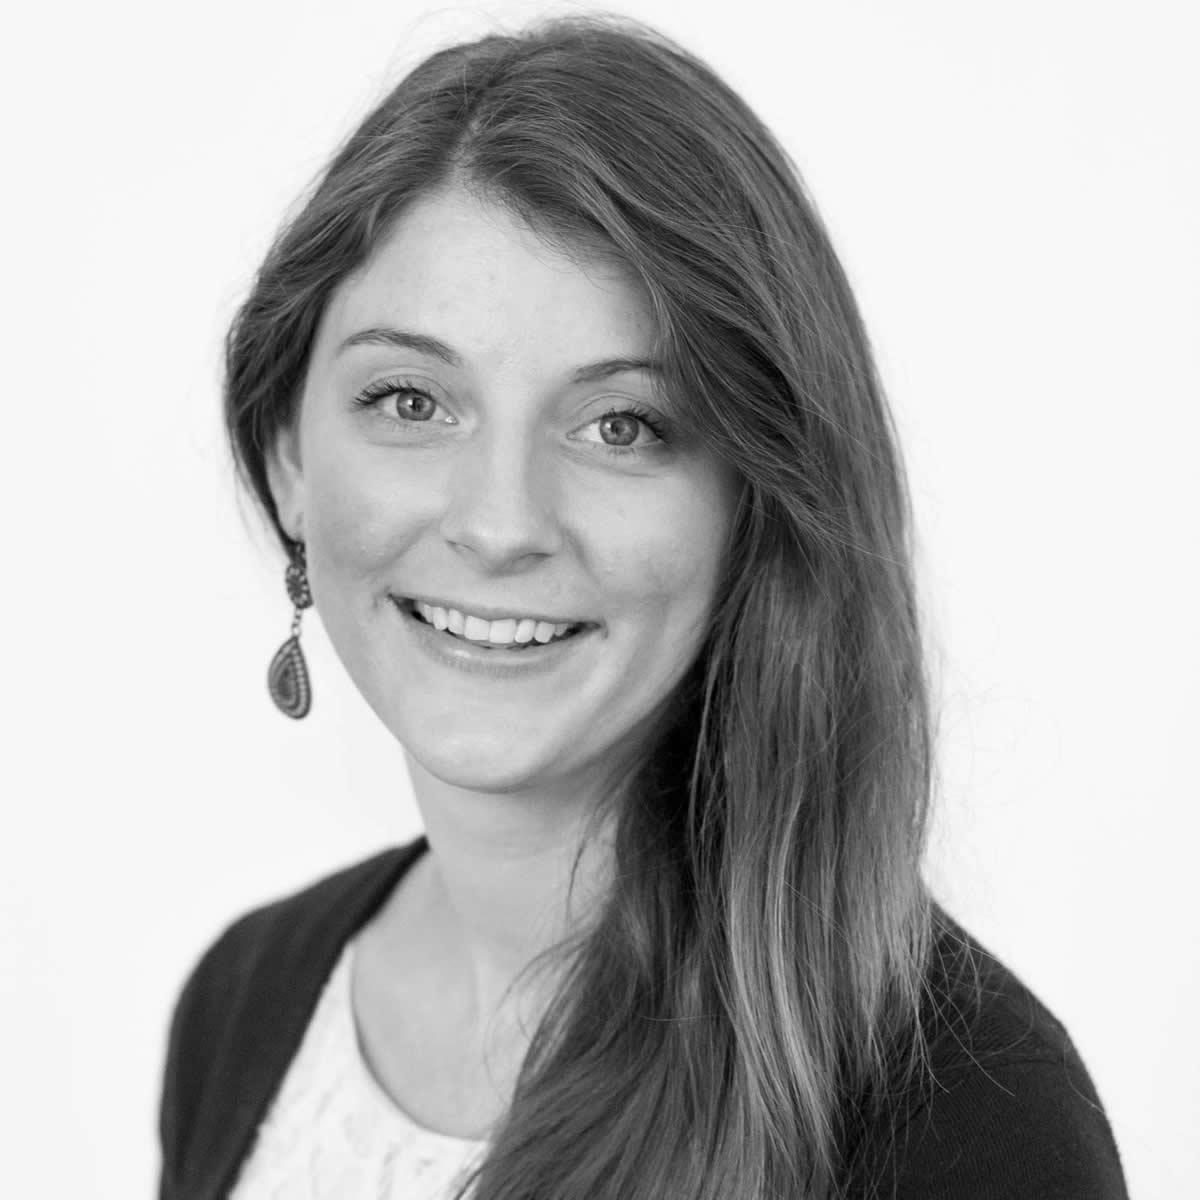 Caitlin Bergman, Senior Product Manager; Enablon